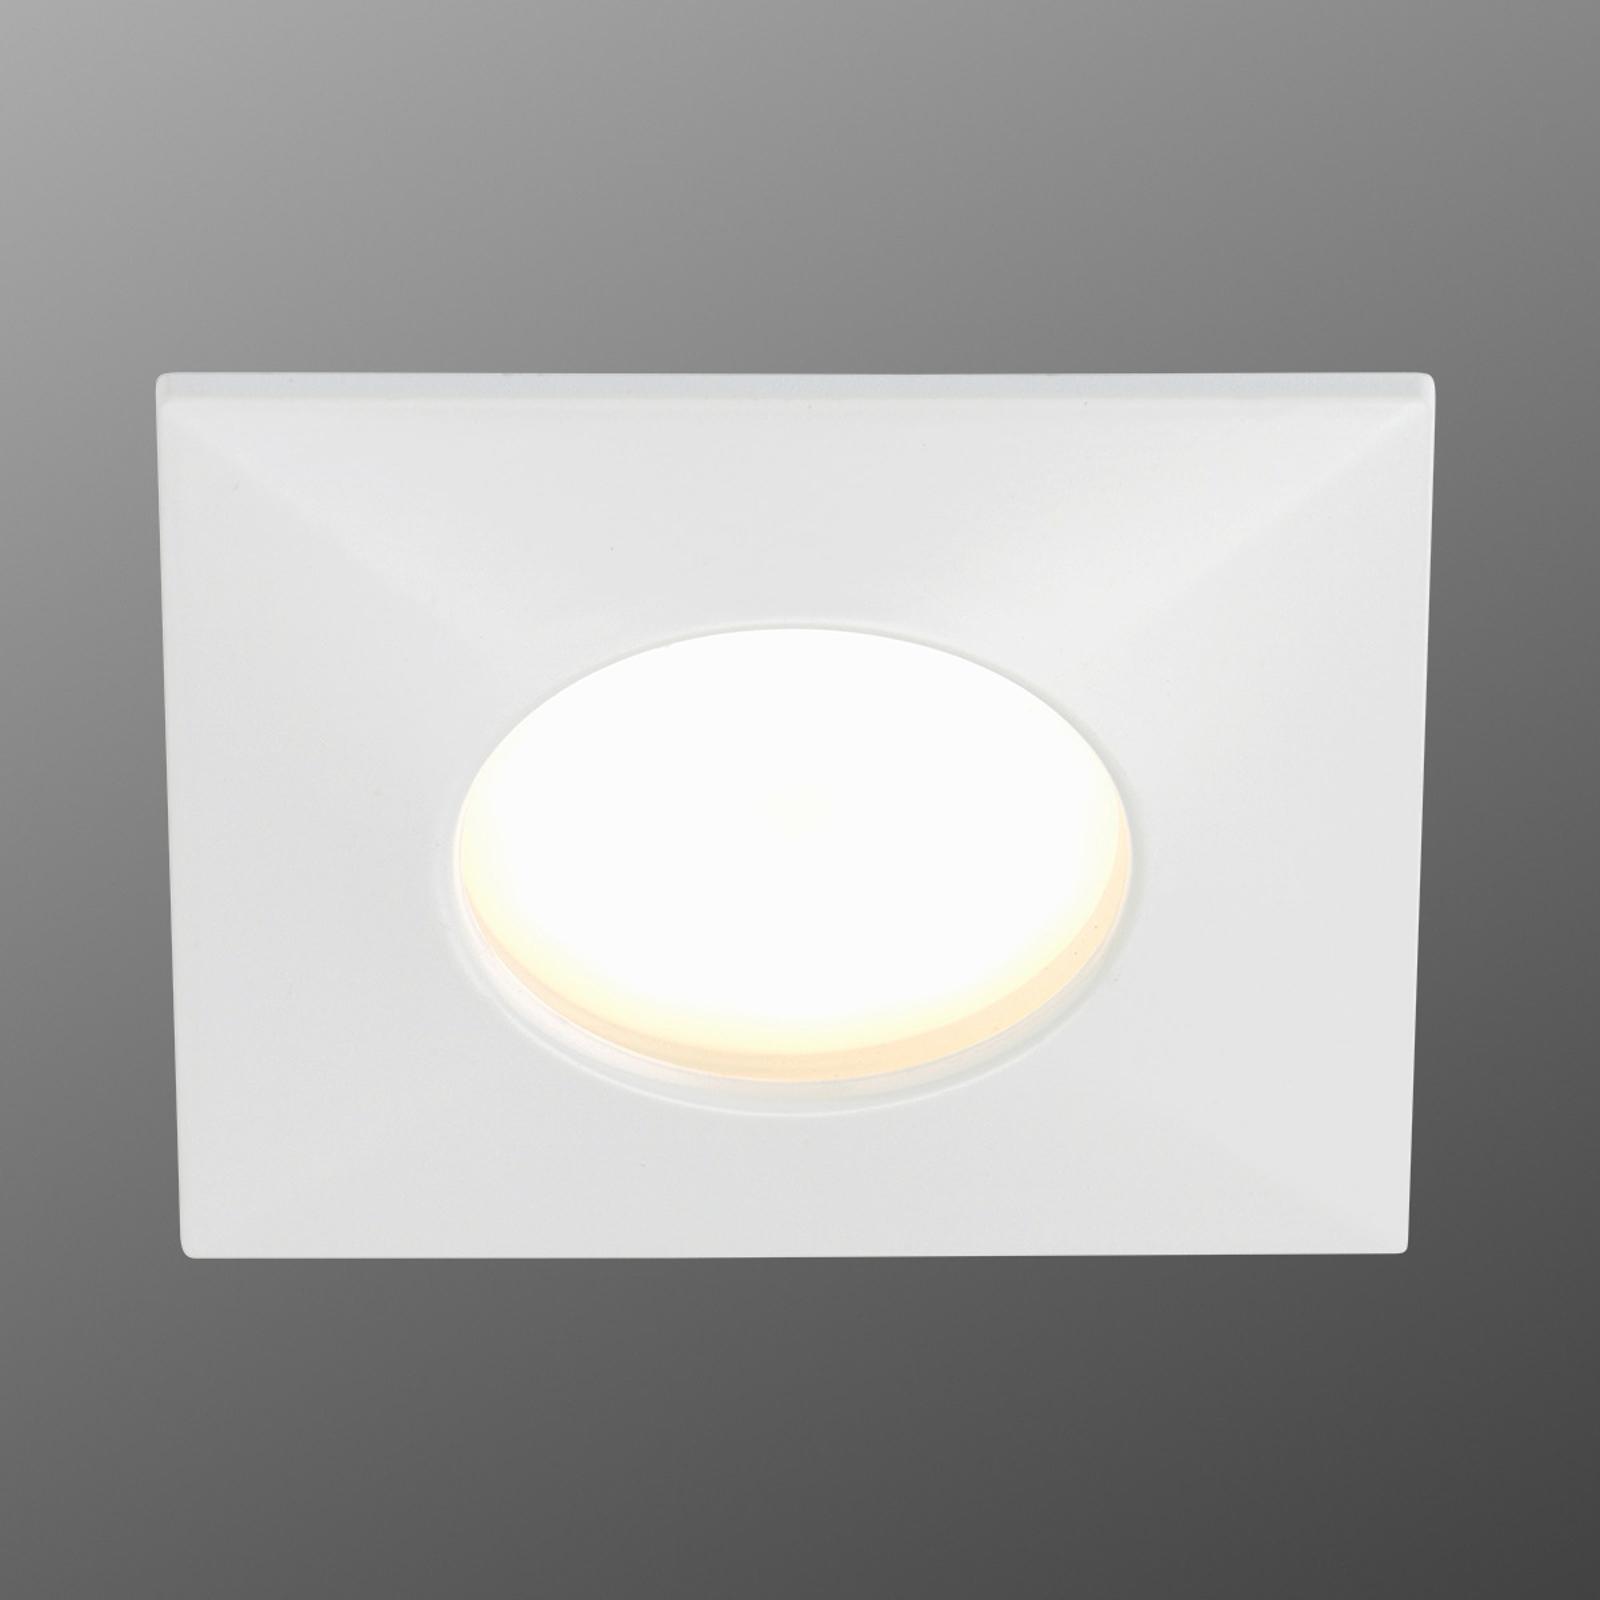 Luca LED inbouwspot IP44 wit